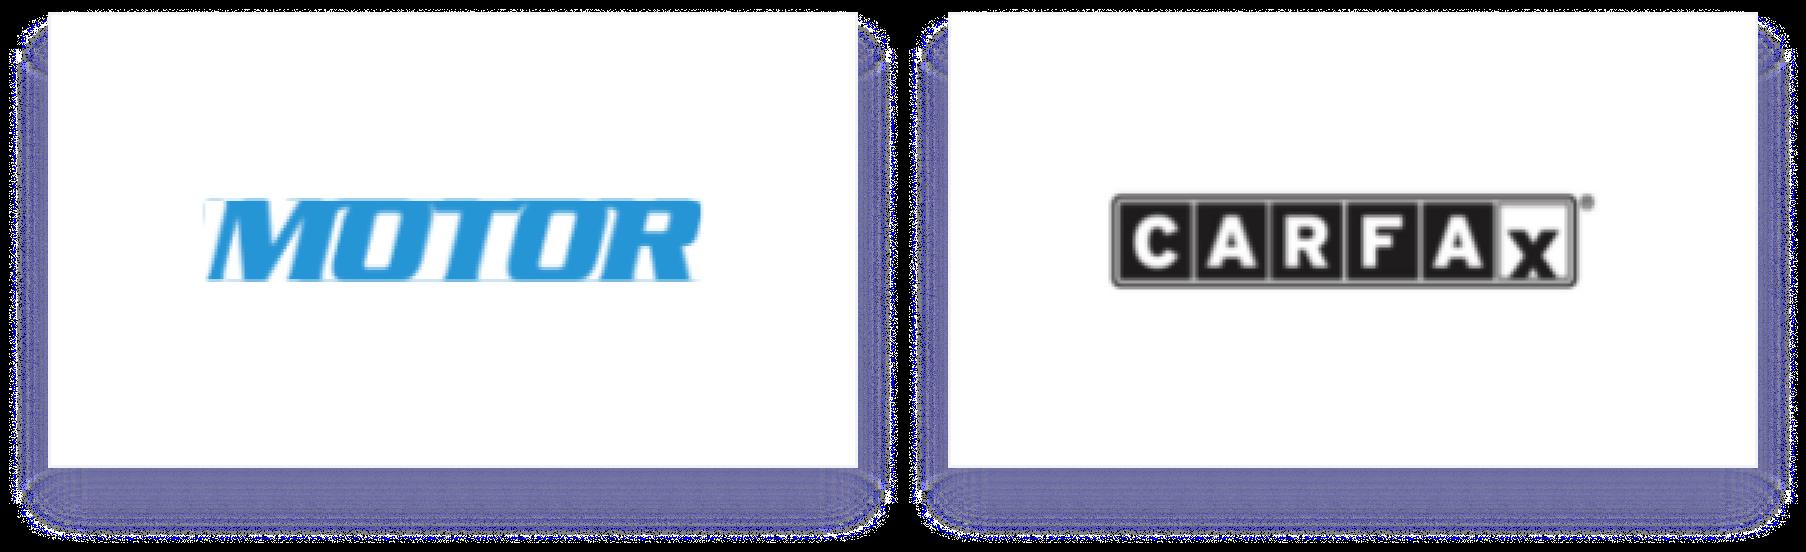 Motor_Carfax img